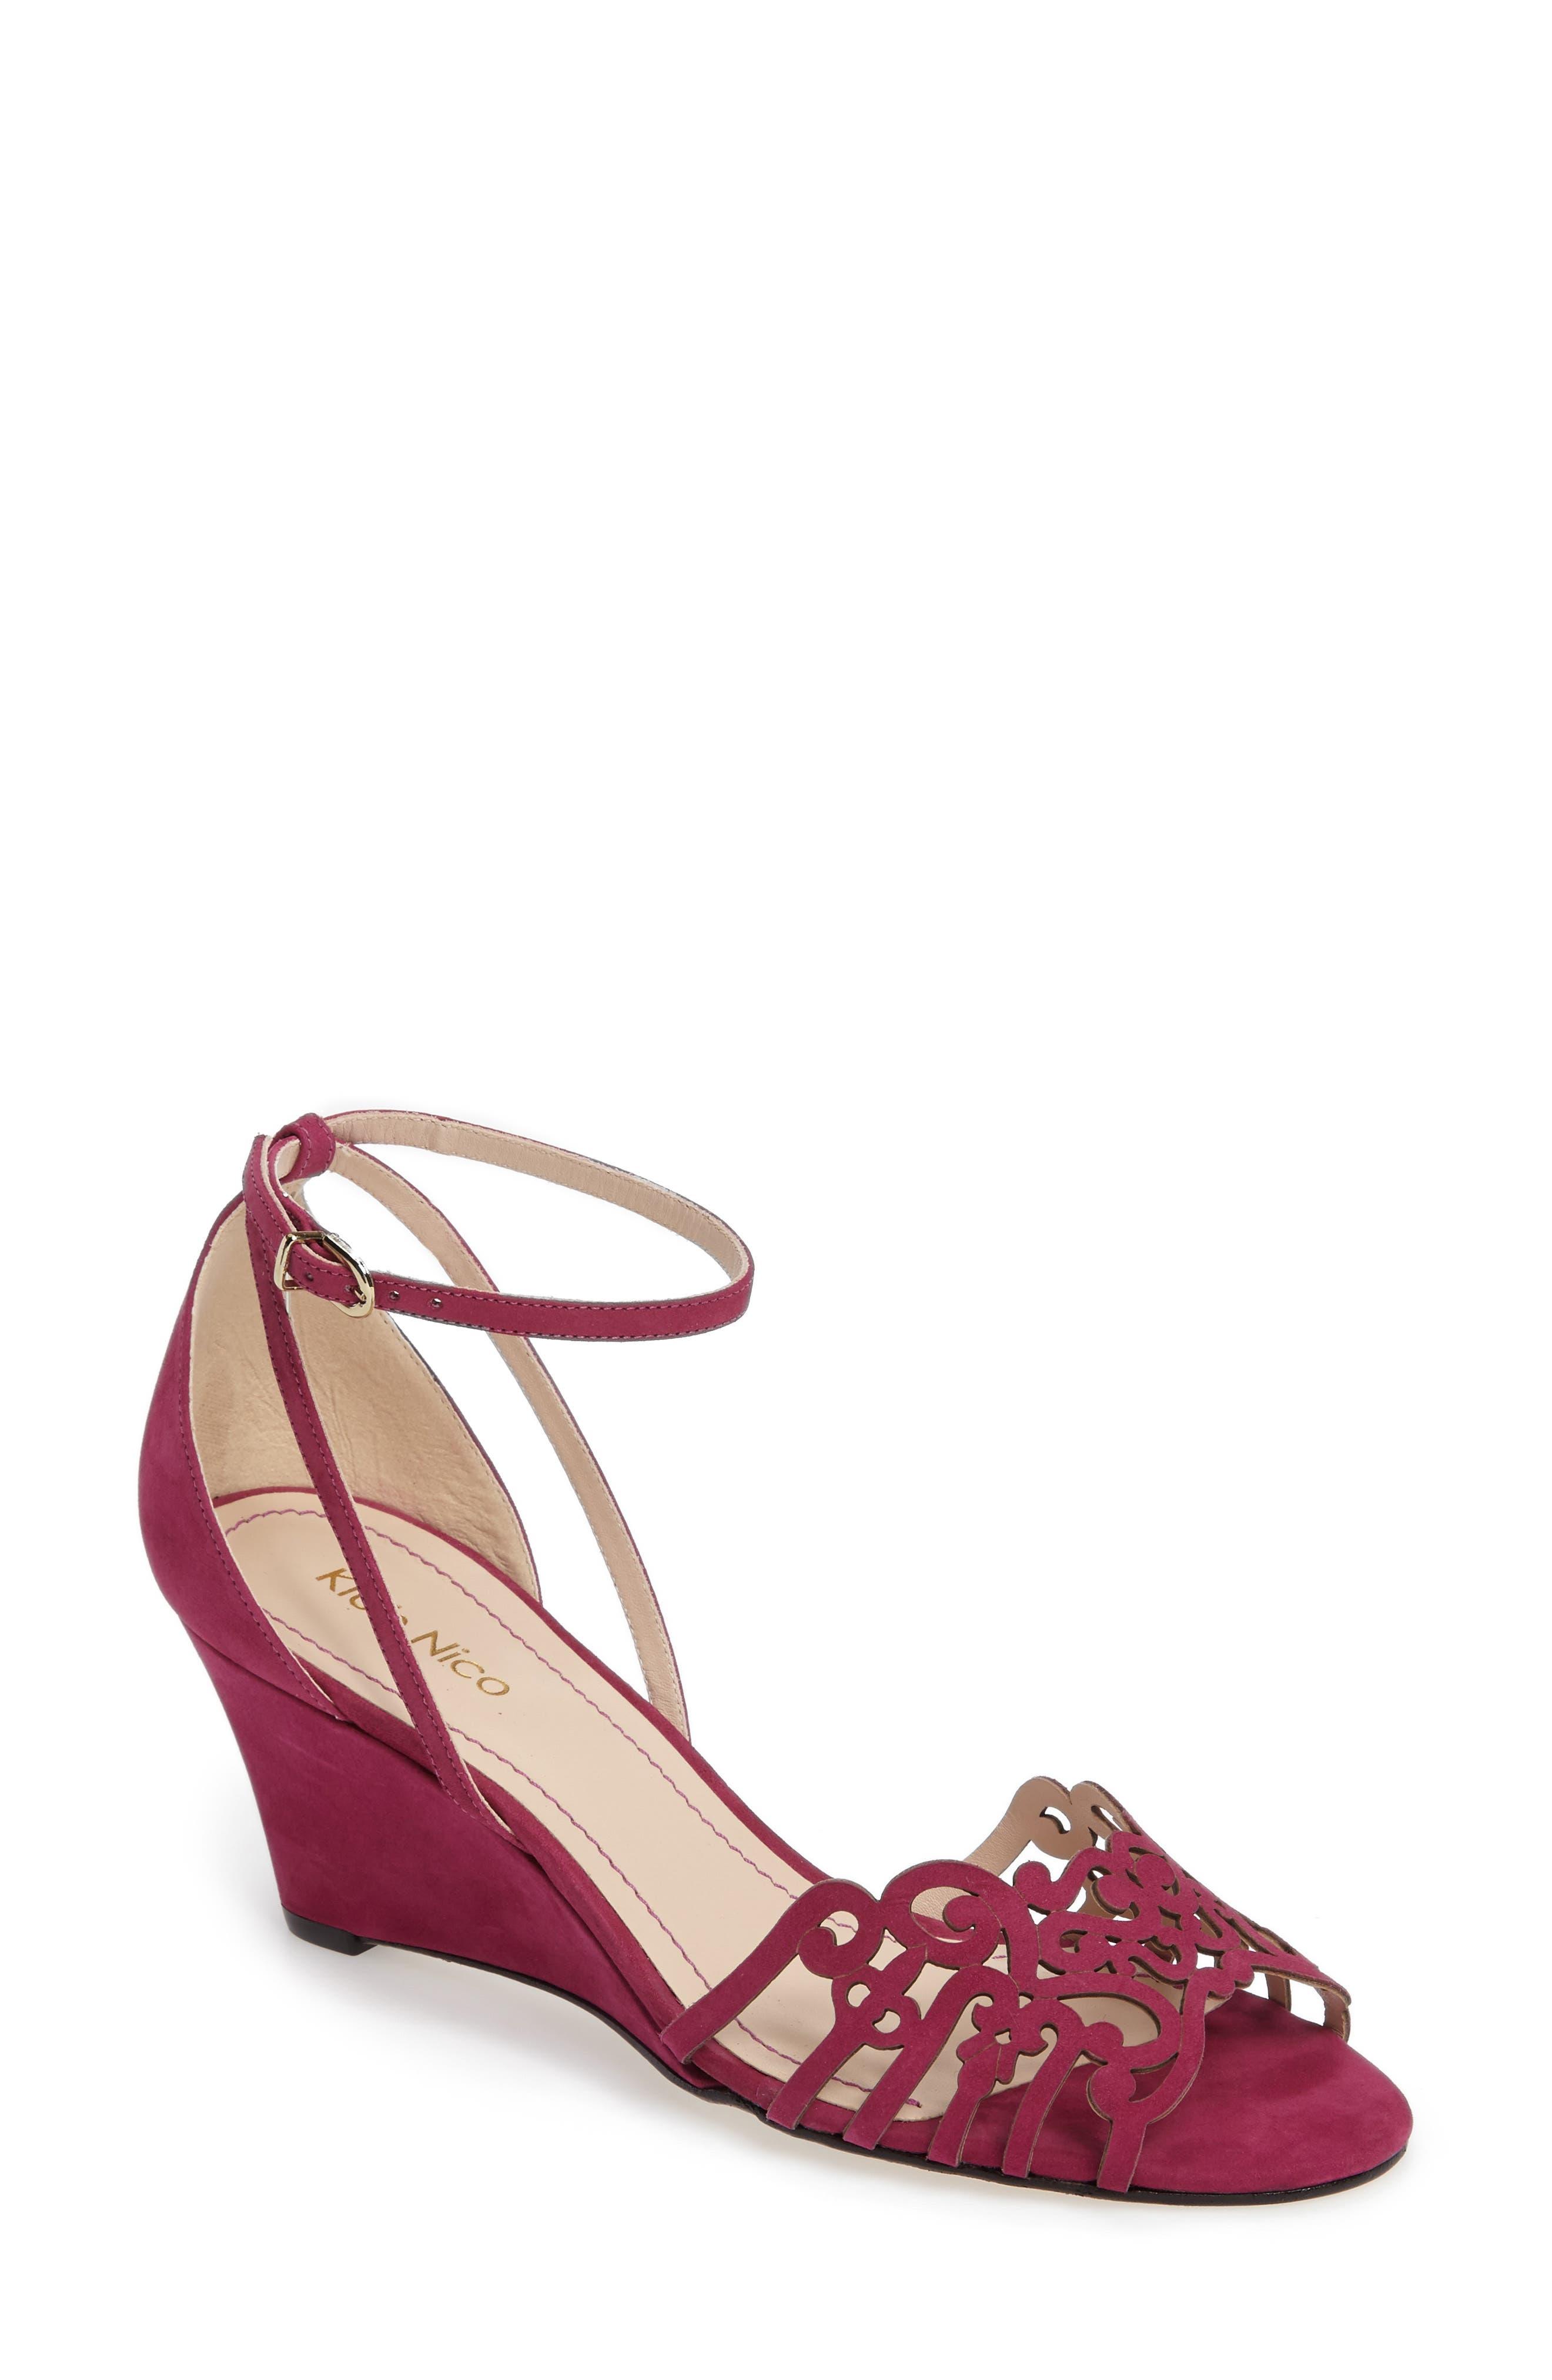 KLUB NICO 'Kingston' Ankle Strap Wedge Sandal, Main, color, MAGENTA LEATHER